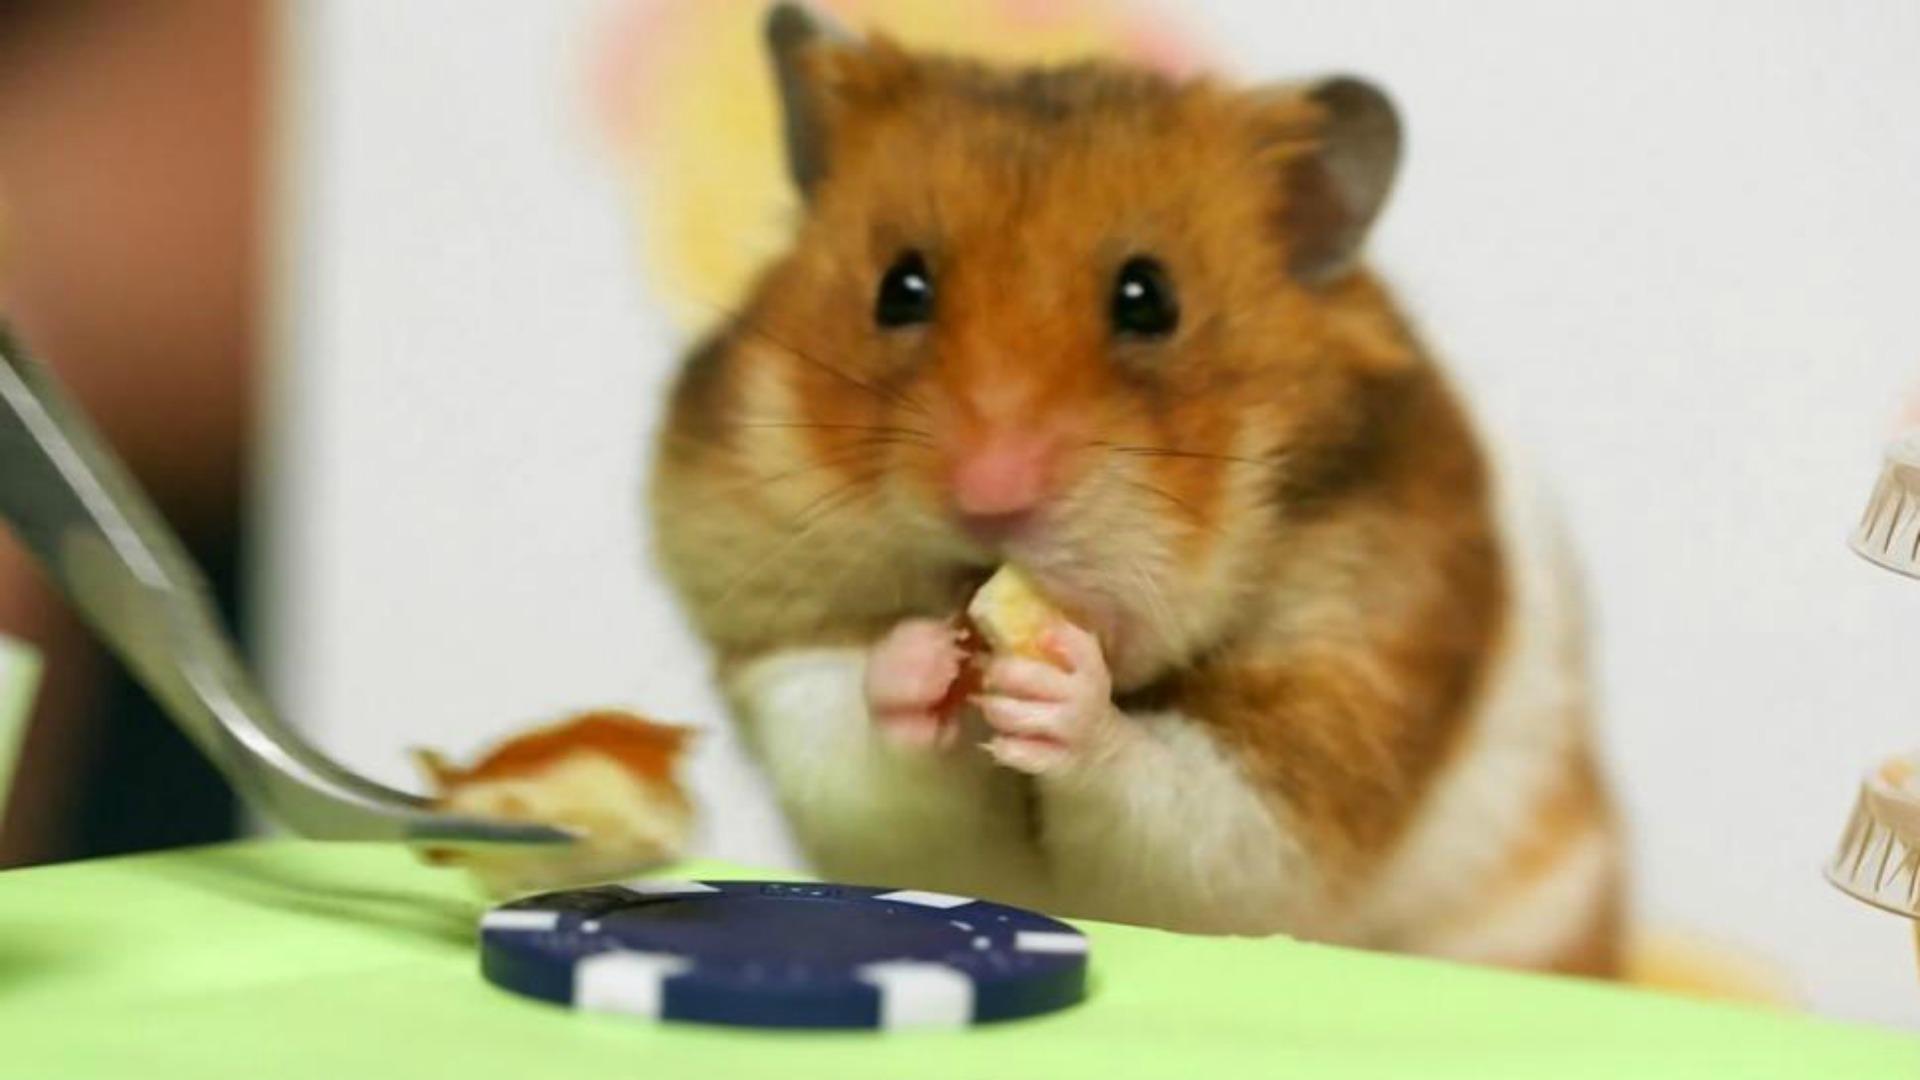 Hamster hot video